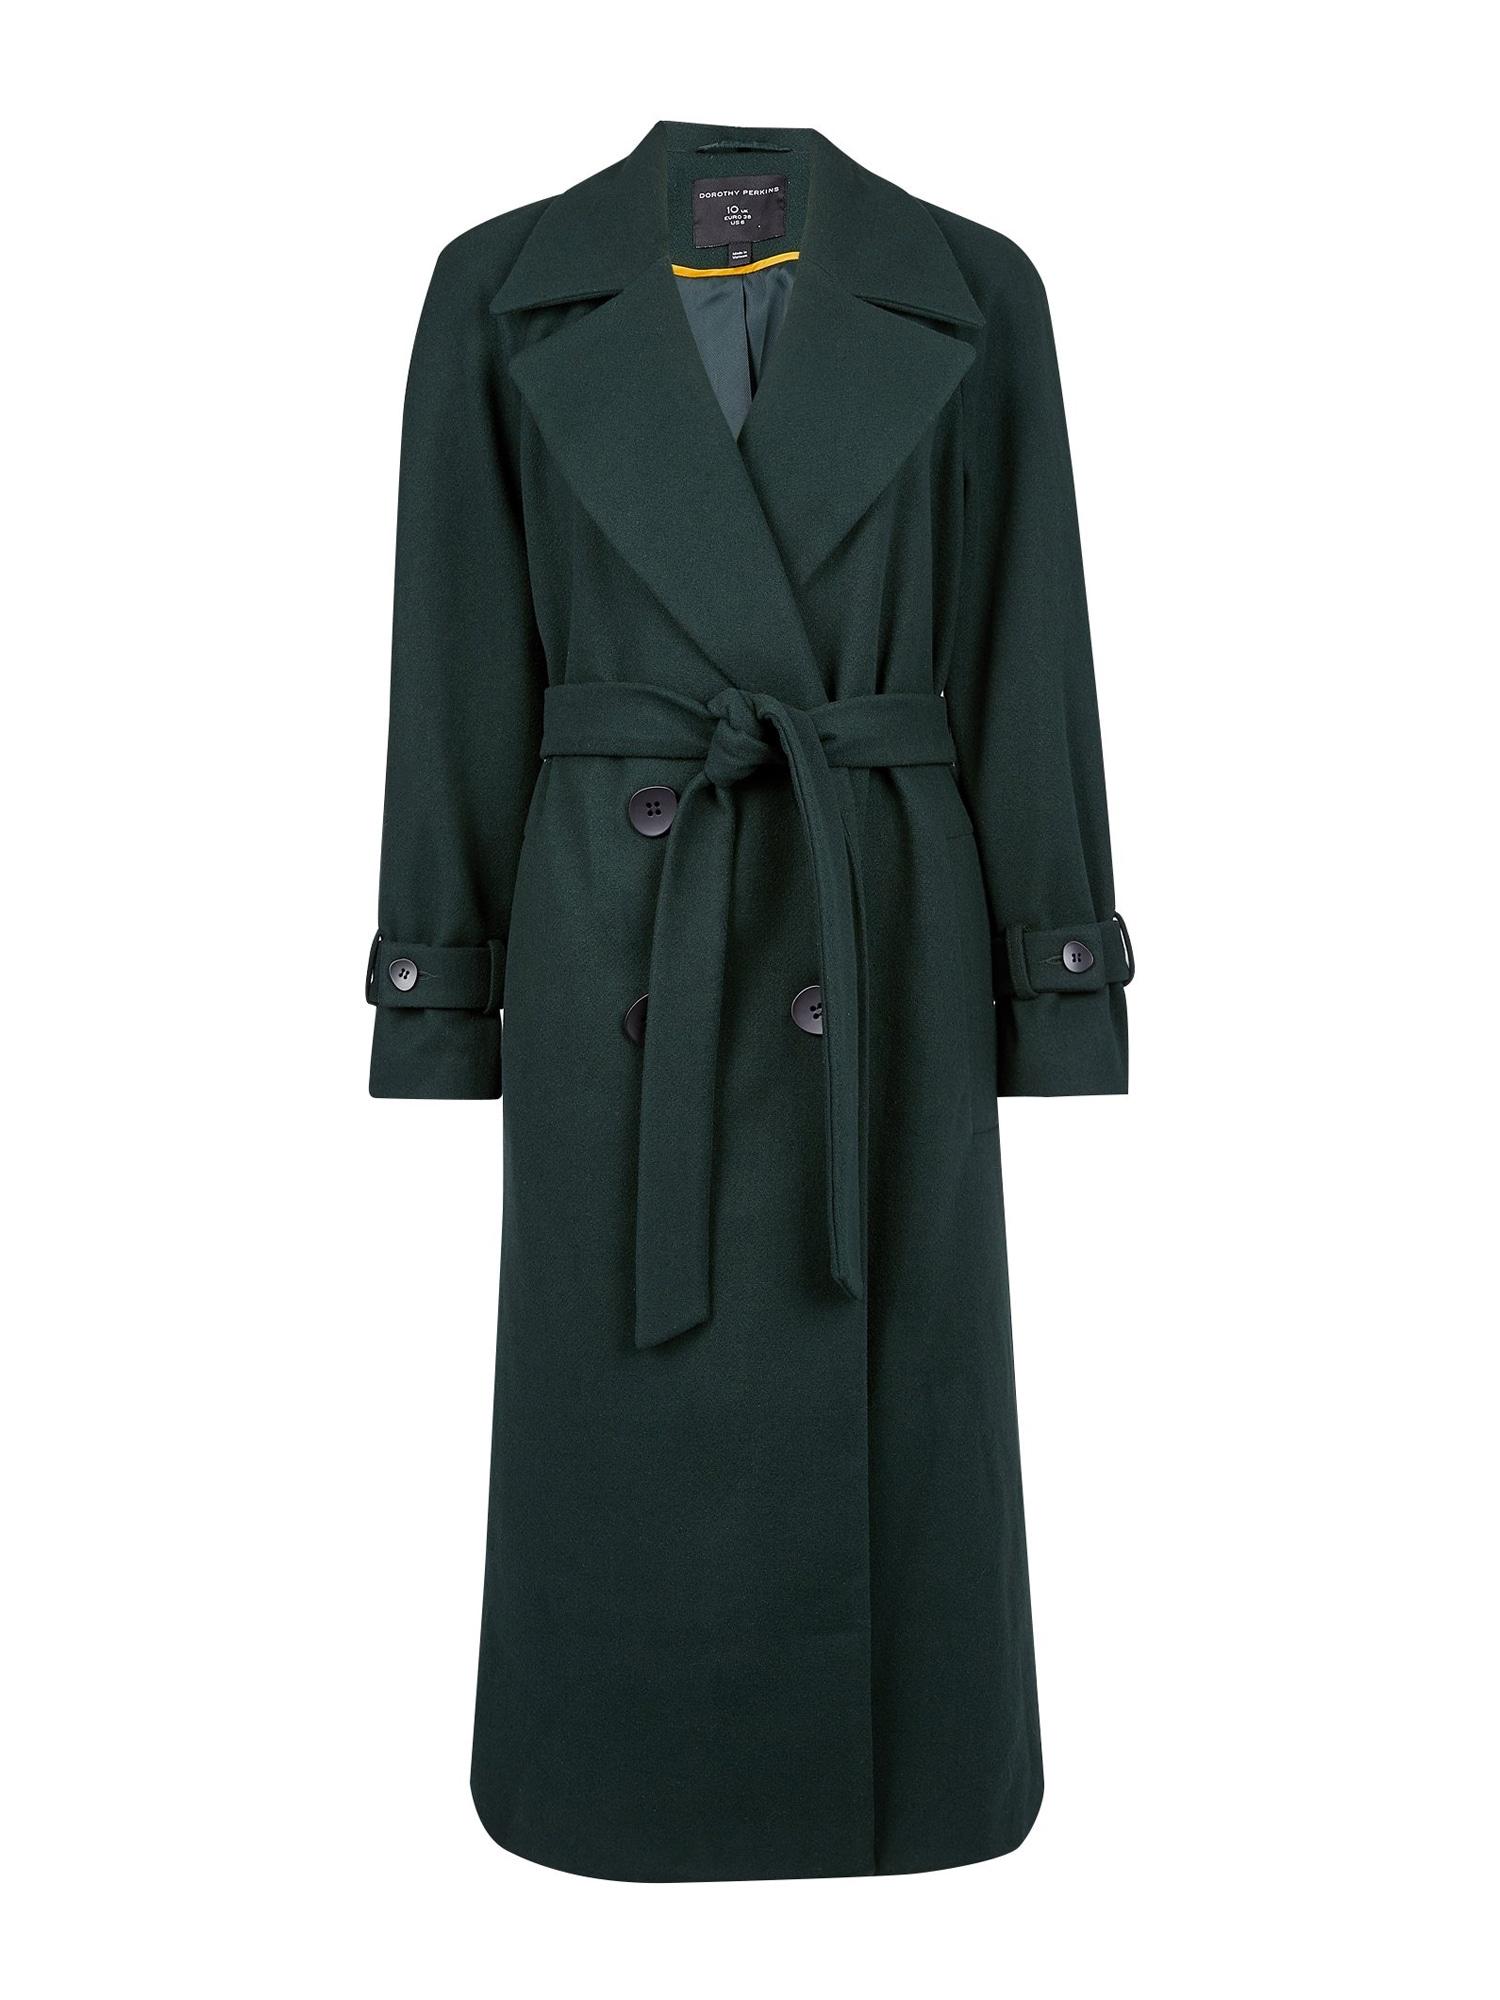 Dorothy Perkins Rudeninis-žieminis paltas 'GREEN DOUBLE' įdegio spalva